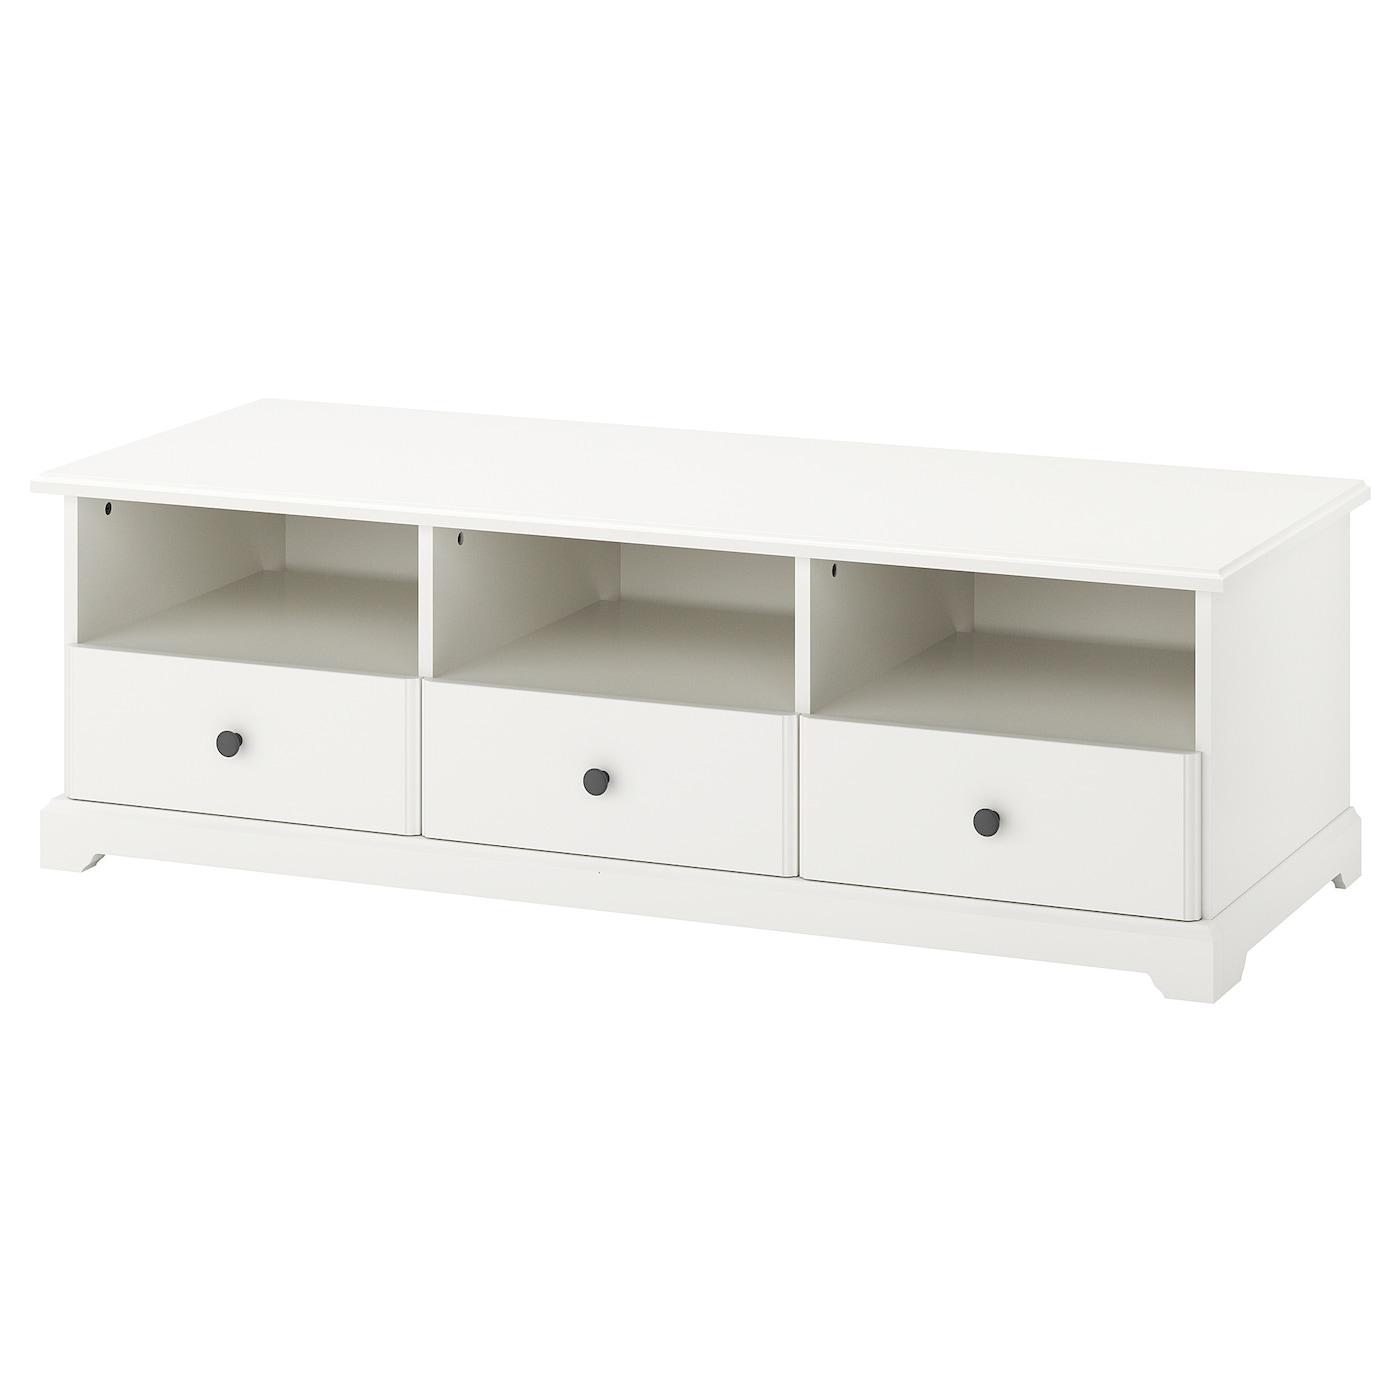 Liatorp mueble tv blanco 145 x 49 x 45 cm ikea for Mueble tv ikea segunda mano